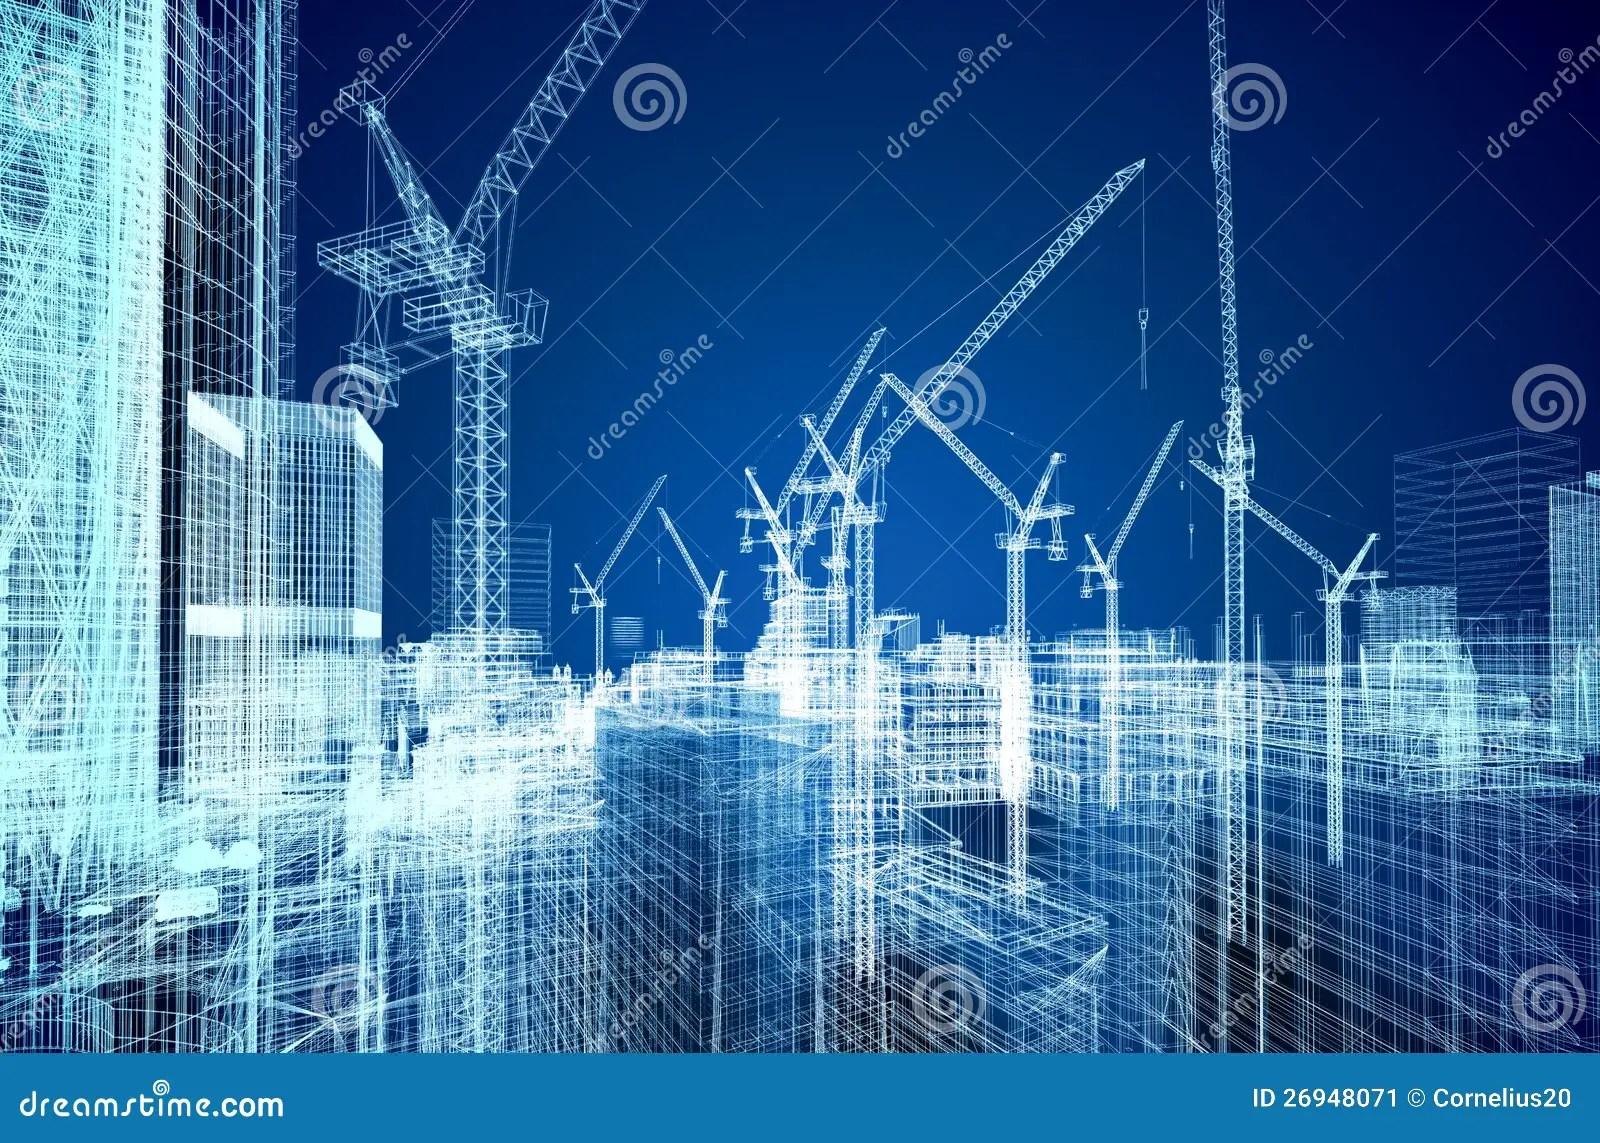 Construction Site Blueprint Stock Image Image 26948071